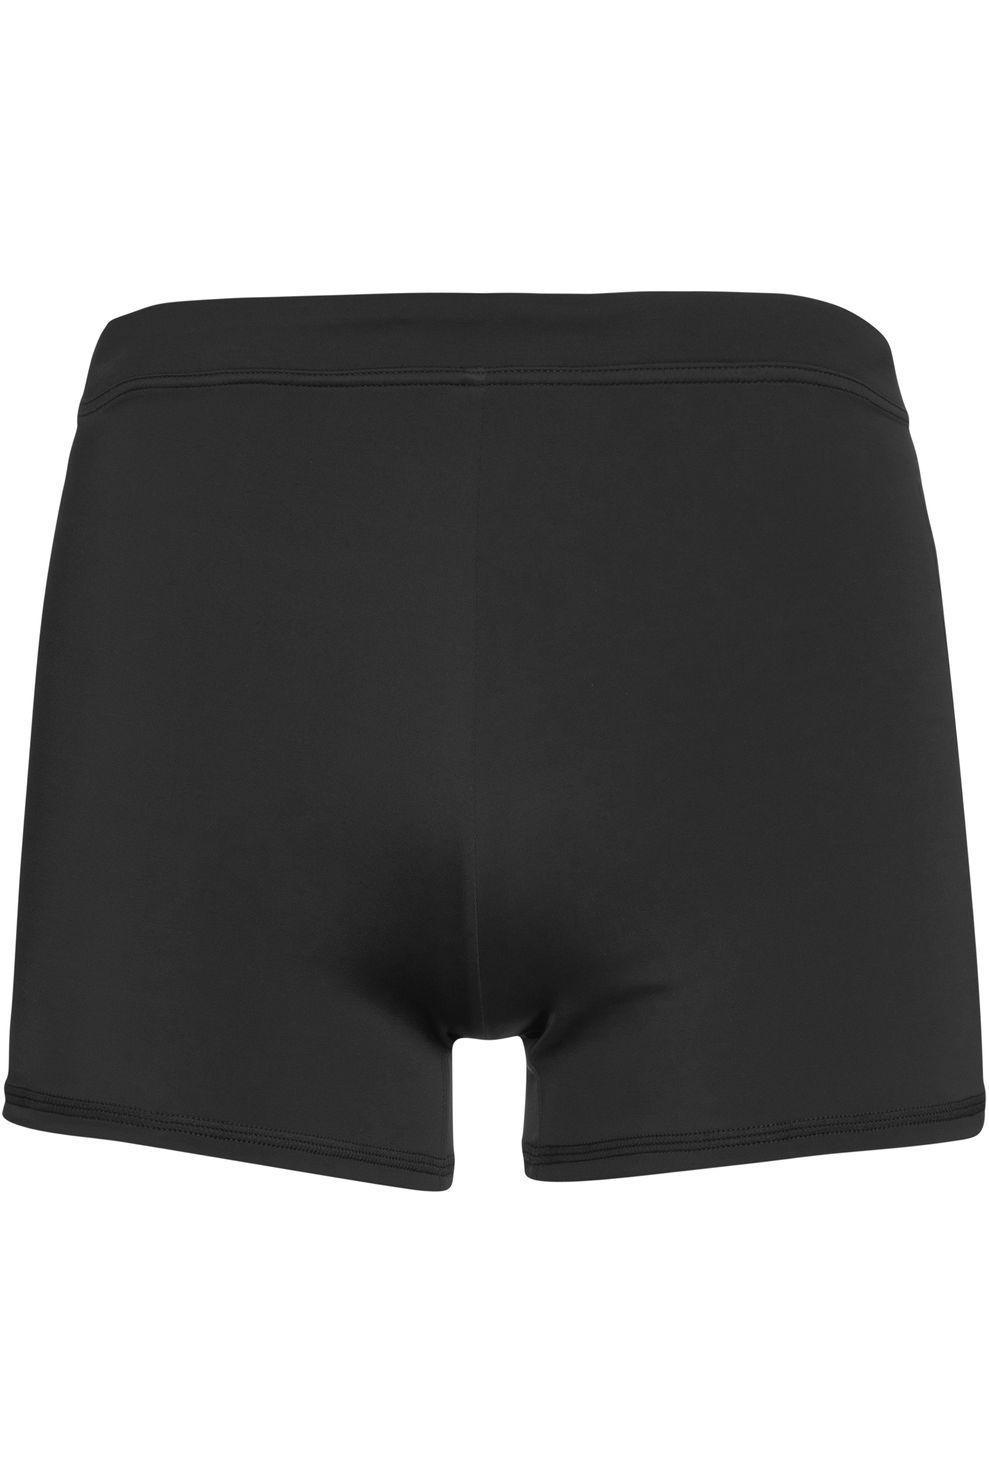 Protest Slip Carst voor heren - Zwart - Maten: S, M, L, XL, XXL